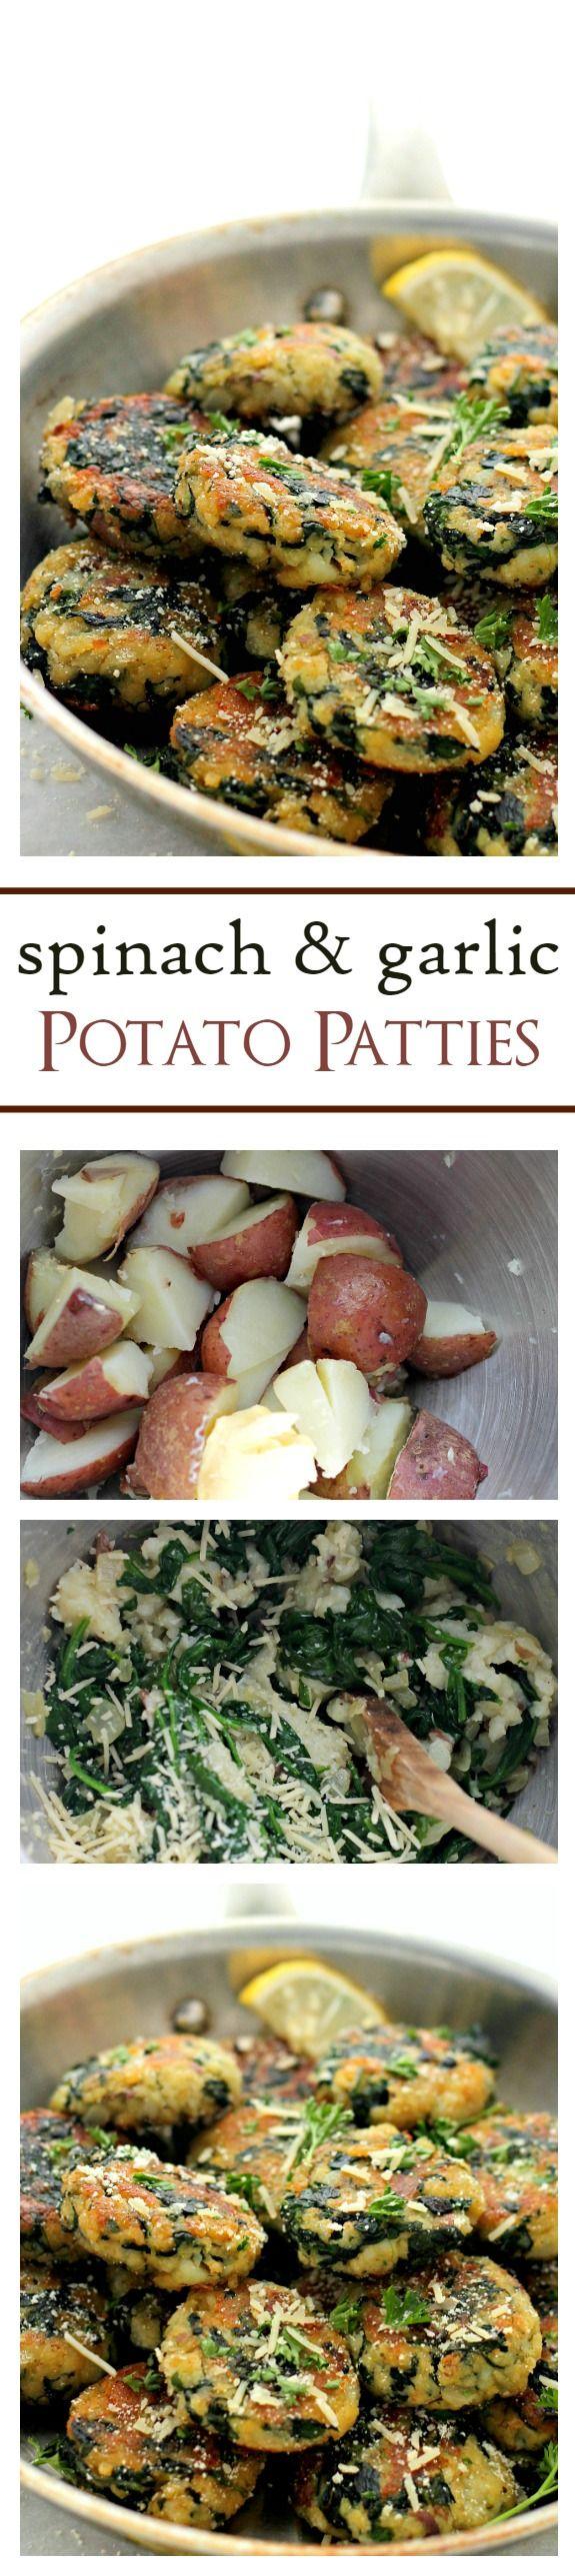 Spinach and Garlic Potato Patties   Yummy side dish recipe.